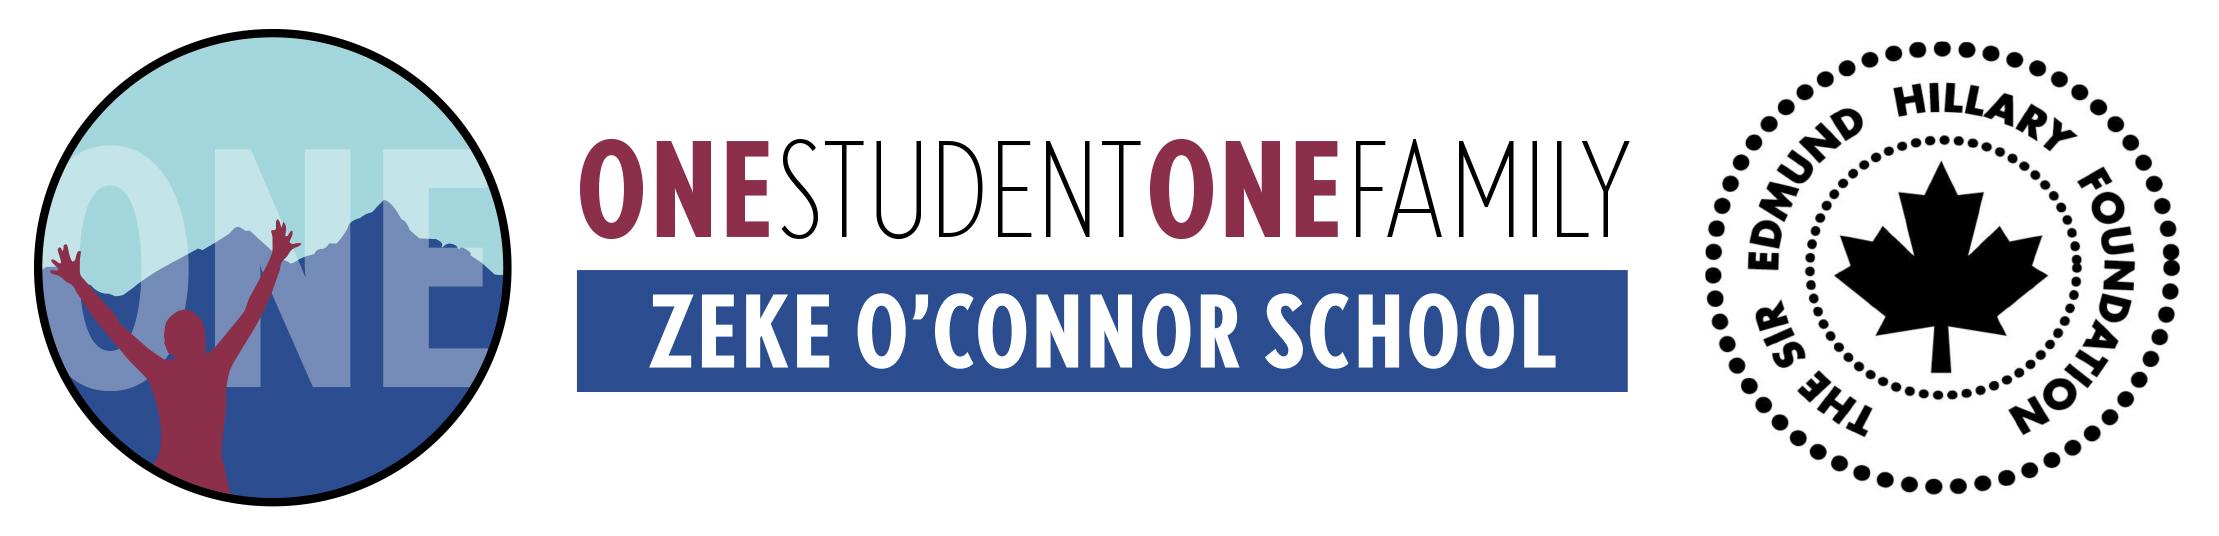 ZEKE O'CONNOR SCHOOL Banner